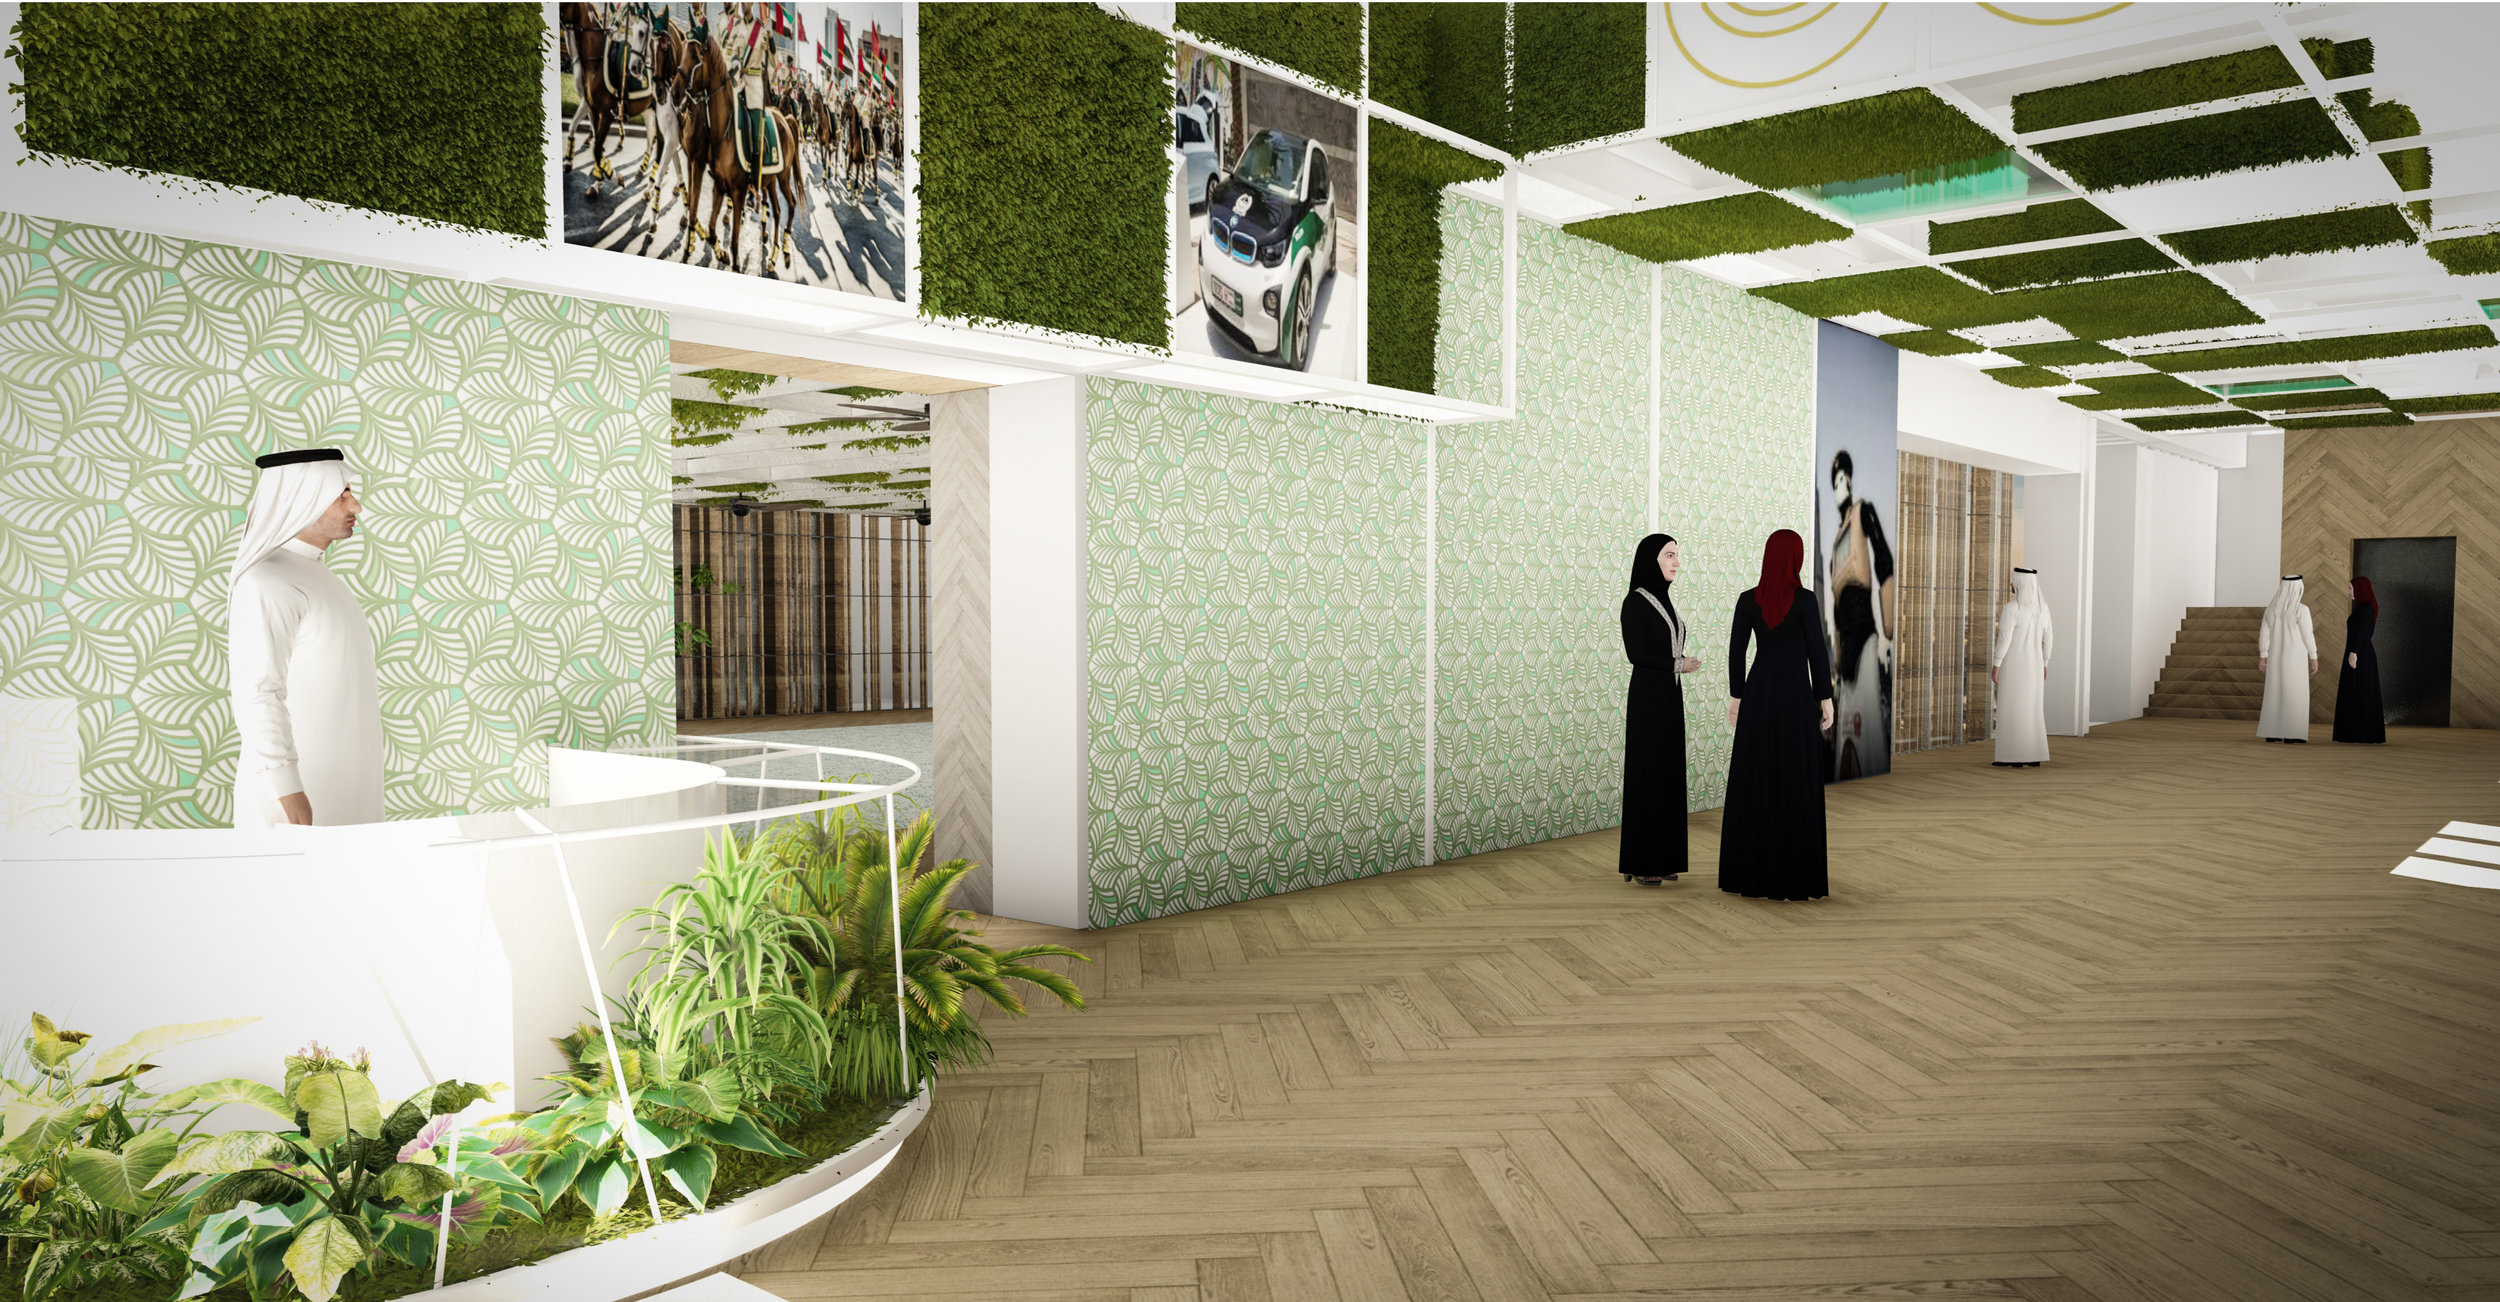 © Copyright Studio DS 2018 - the Dubai Police Innovation Hub Interior Design 1